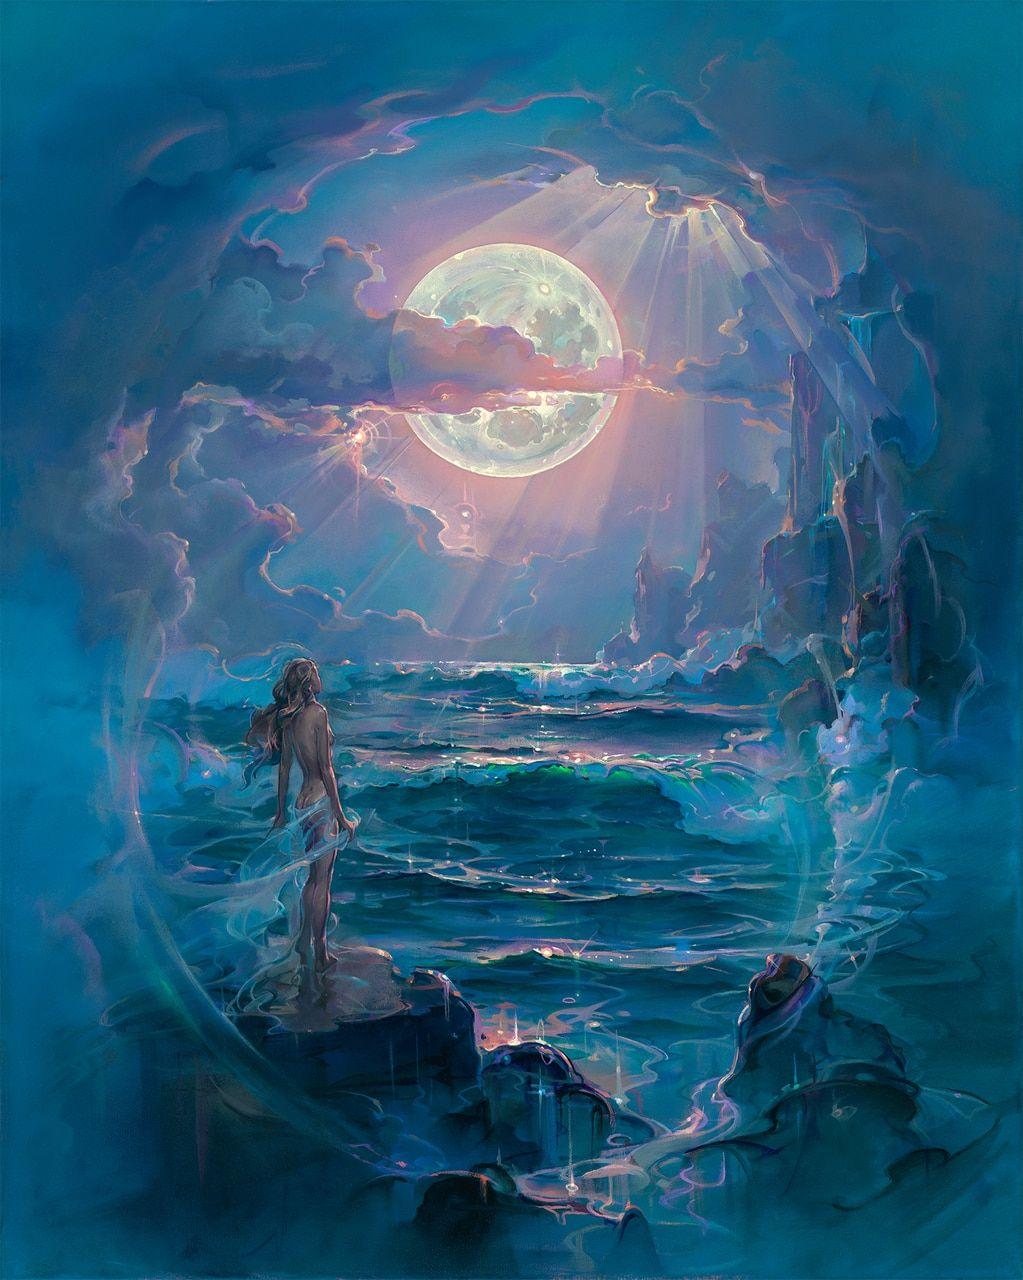 Moonlit Dream  #PitreFineArts #JohnPitreArt #PitreEyeCandyArt #JohnPitre #EyeCandyArt